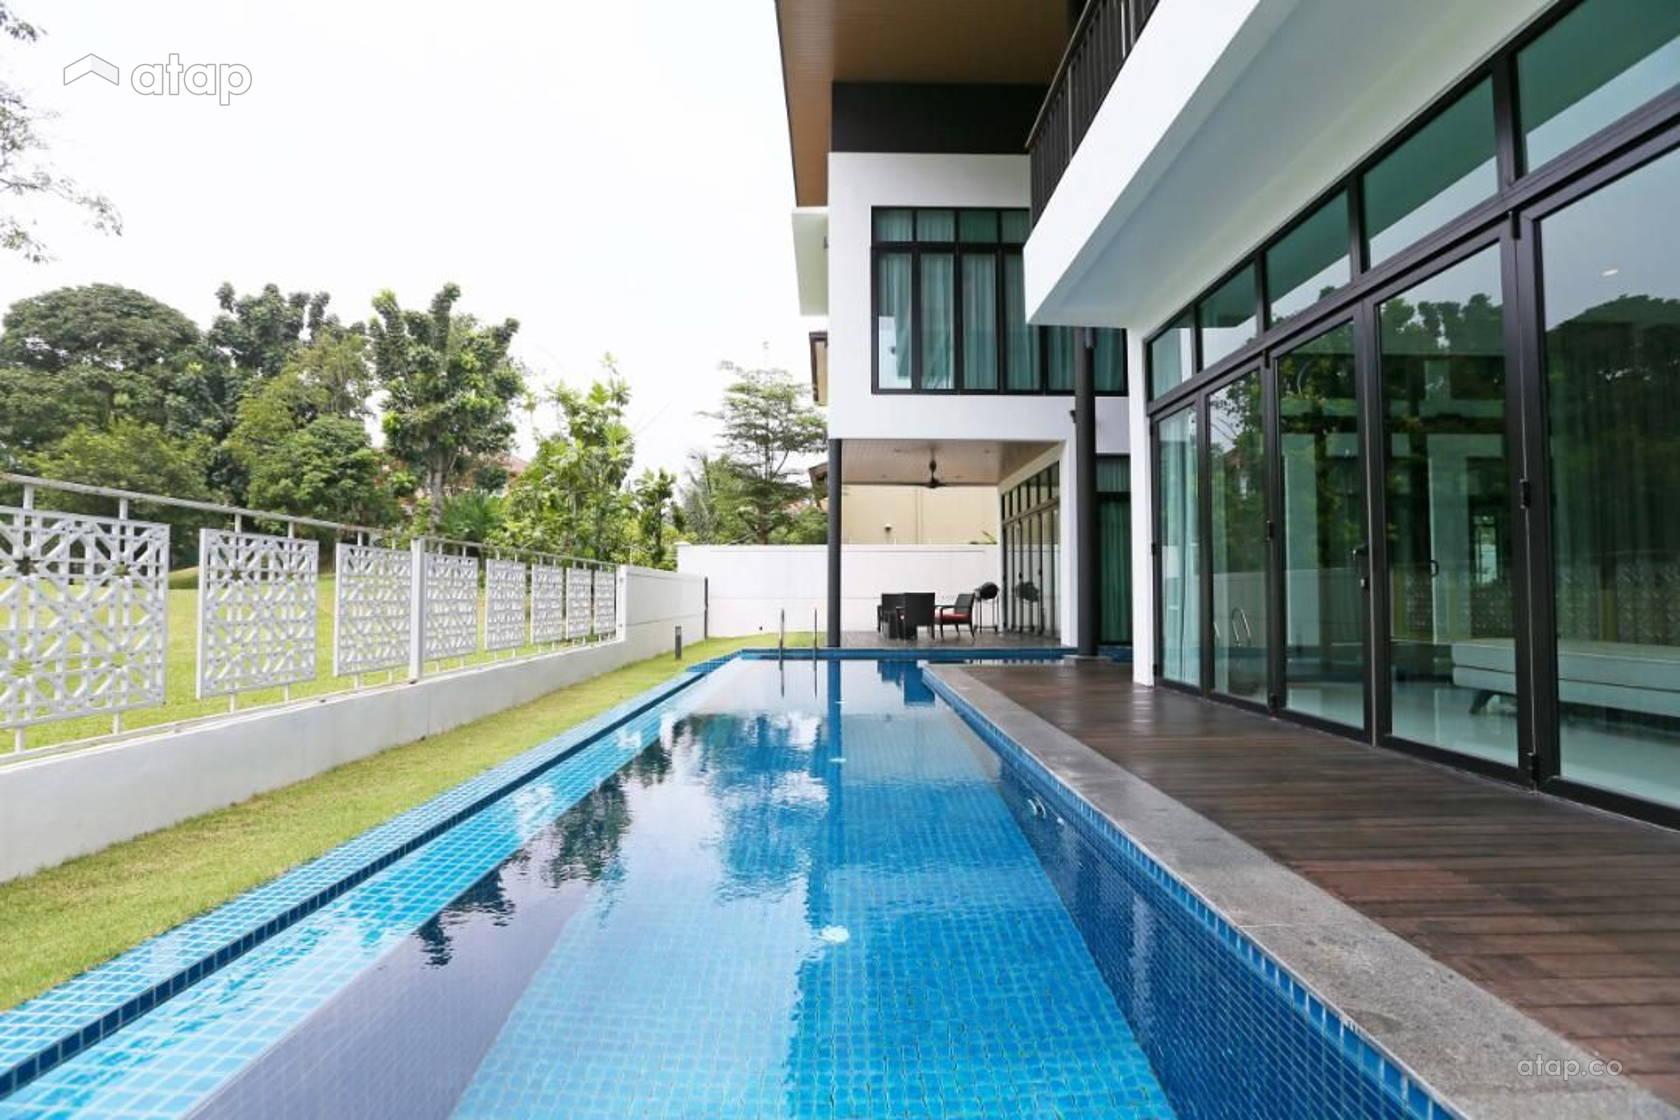 Inground swimming pool that curves around the house for maximum aesthetic pleasure at Haus Saujana Impian.